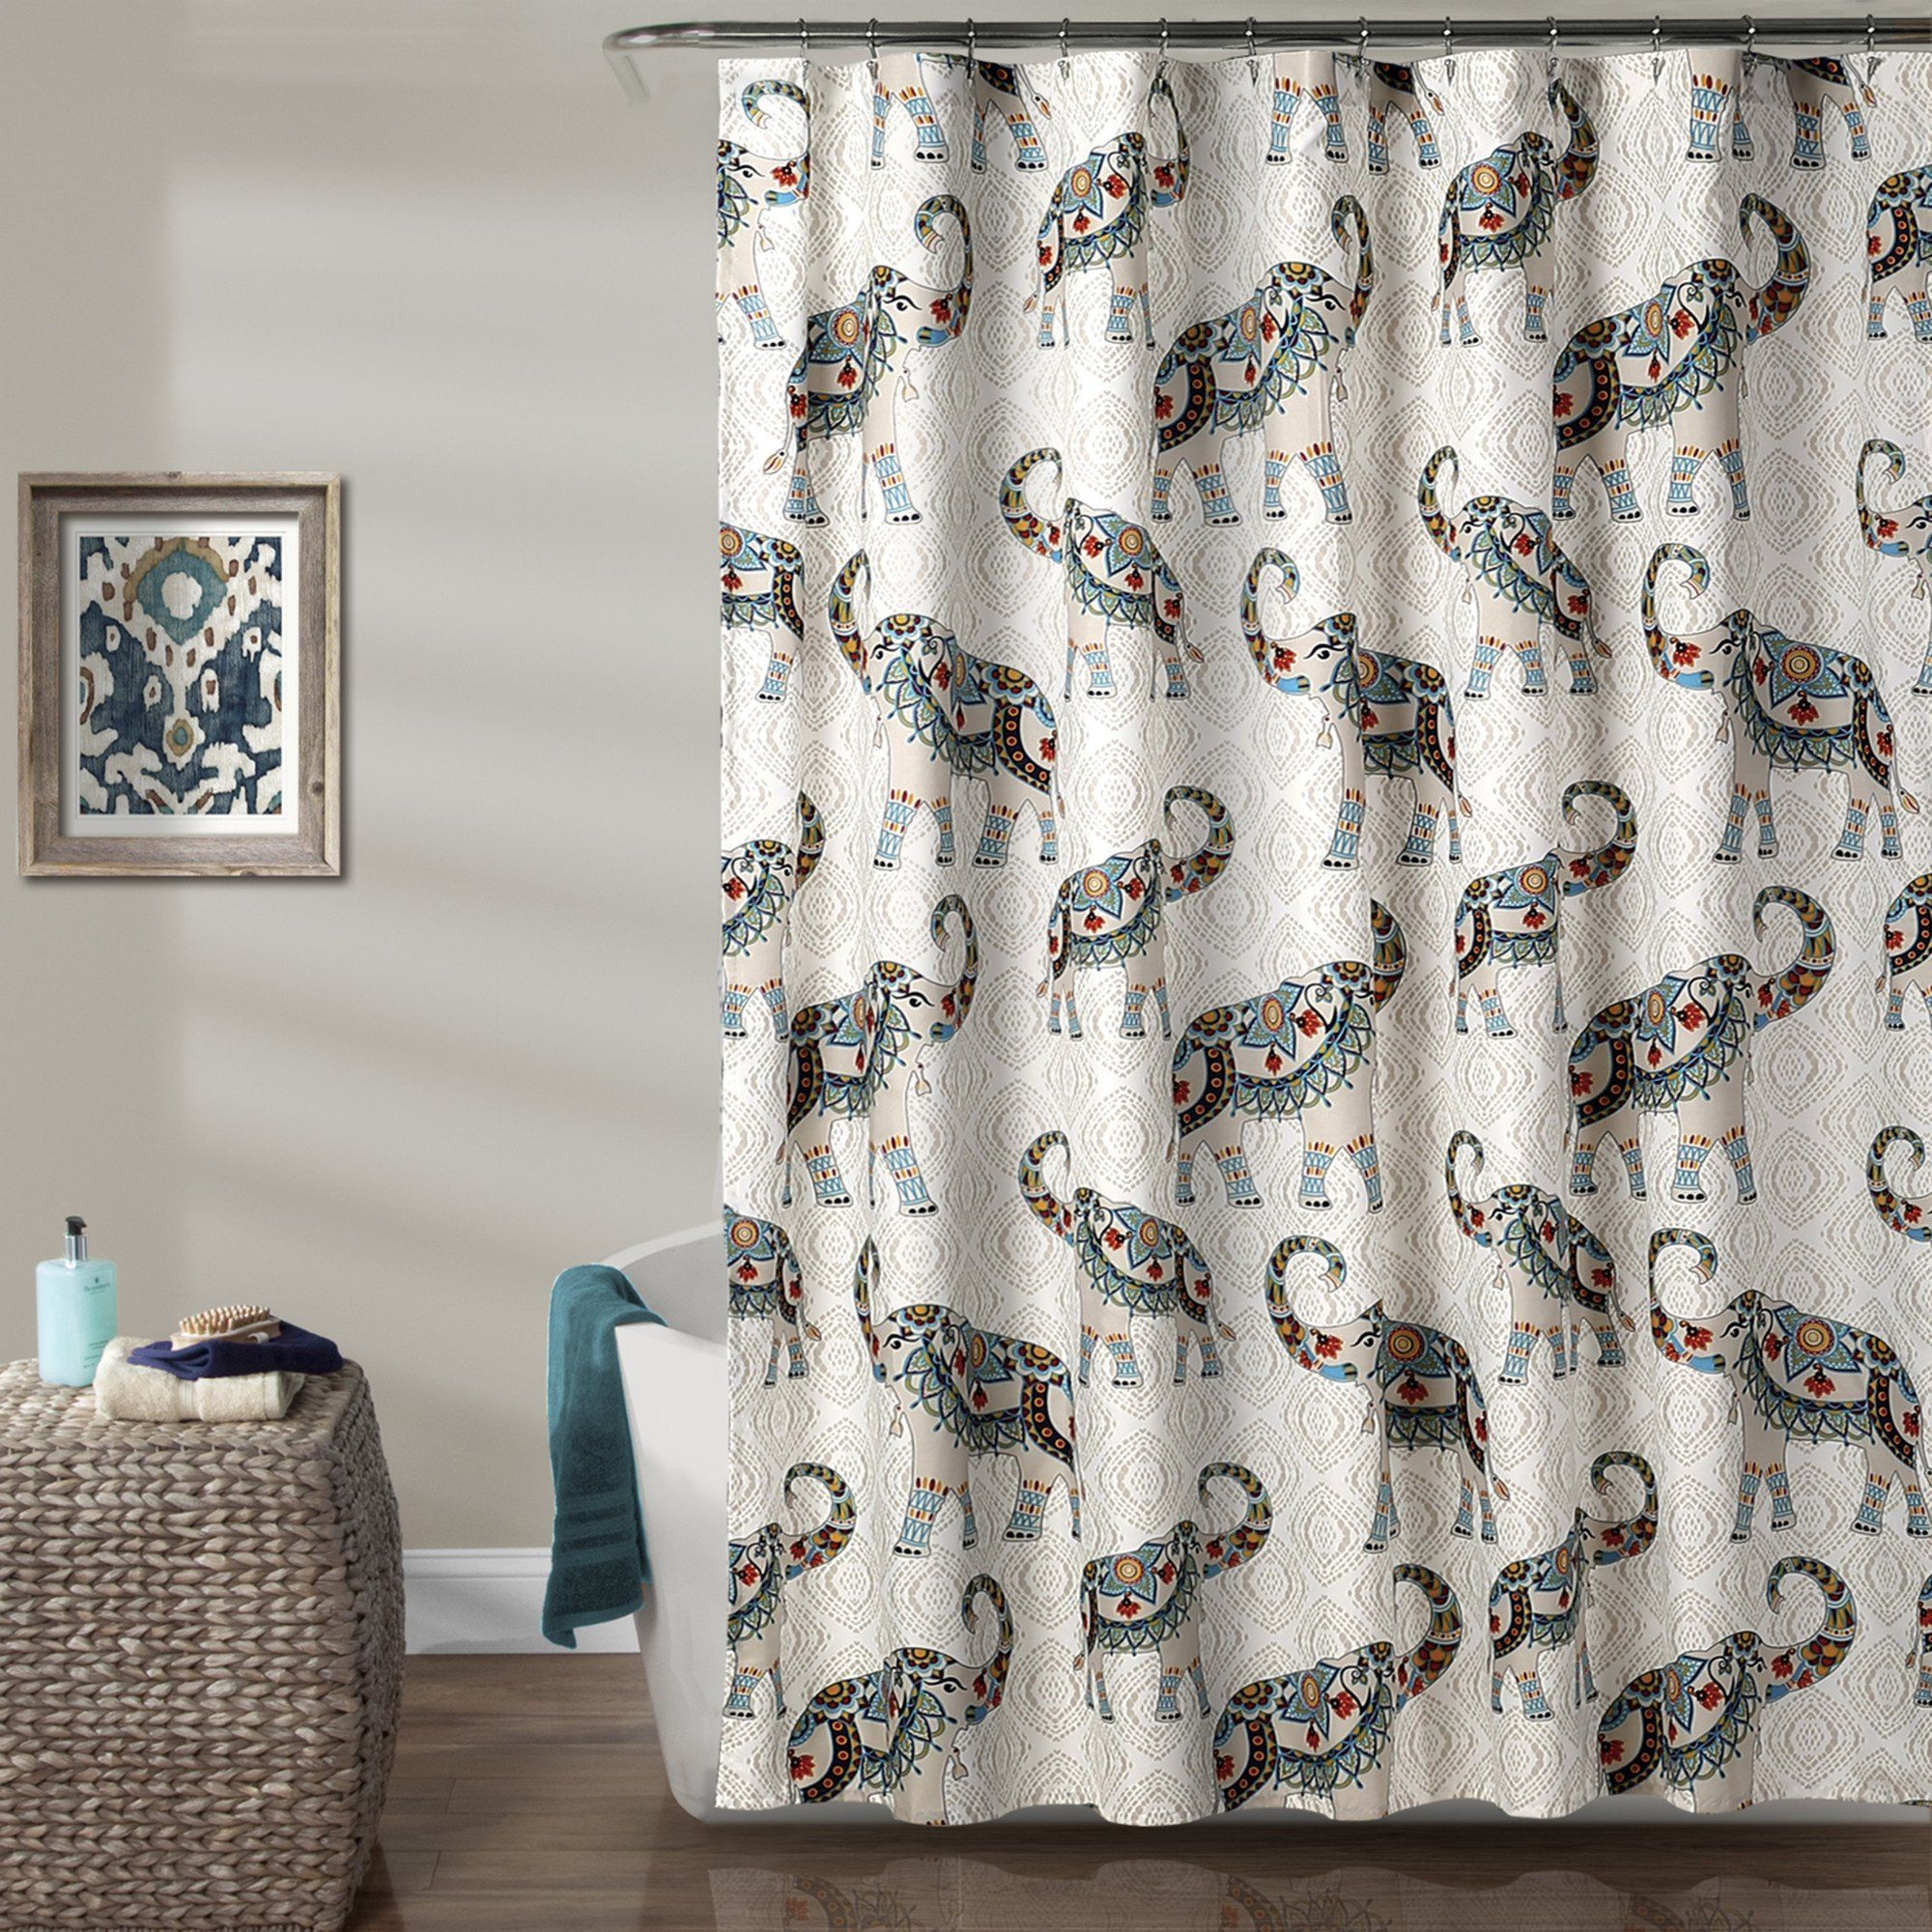 Hati Elephants Shower Curtain Elephant Curtains Jpg 2000x2000 Anthropologies Tender Falls